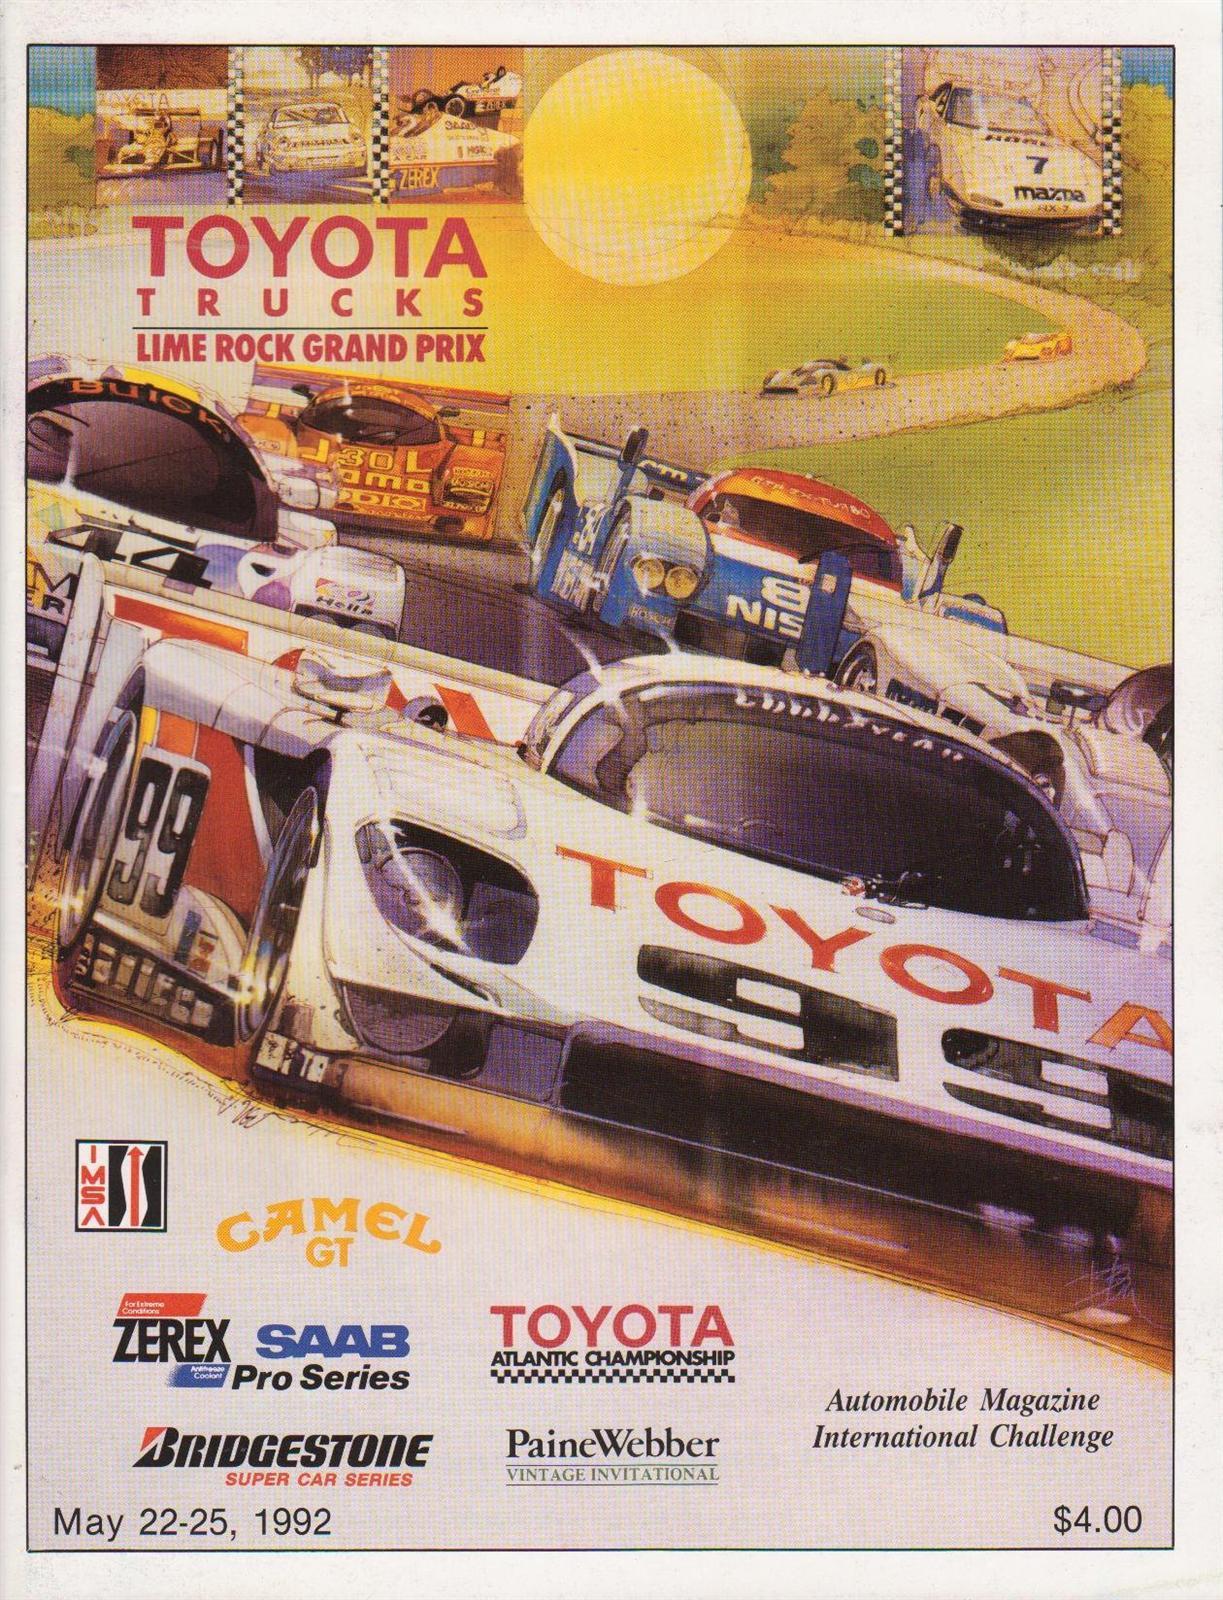 Laguna Seca Raceway >> 1992 IMSA GT Championship Programmes | The Motor Racing Programme Covers Project